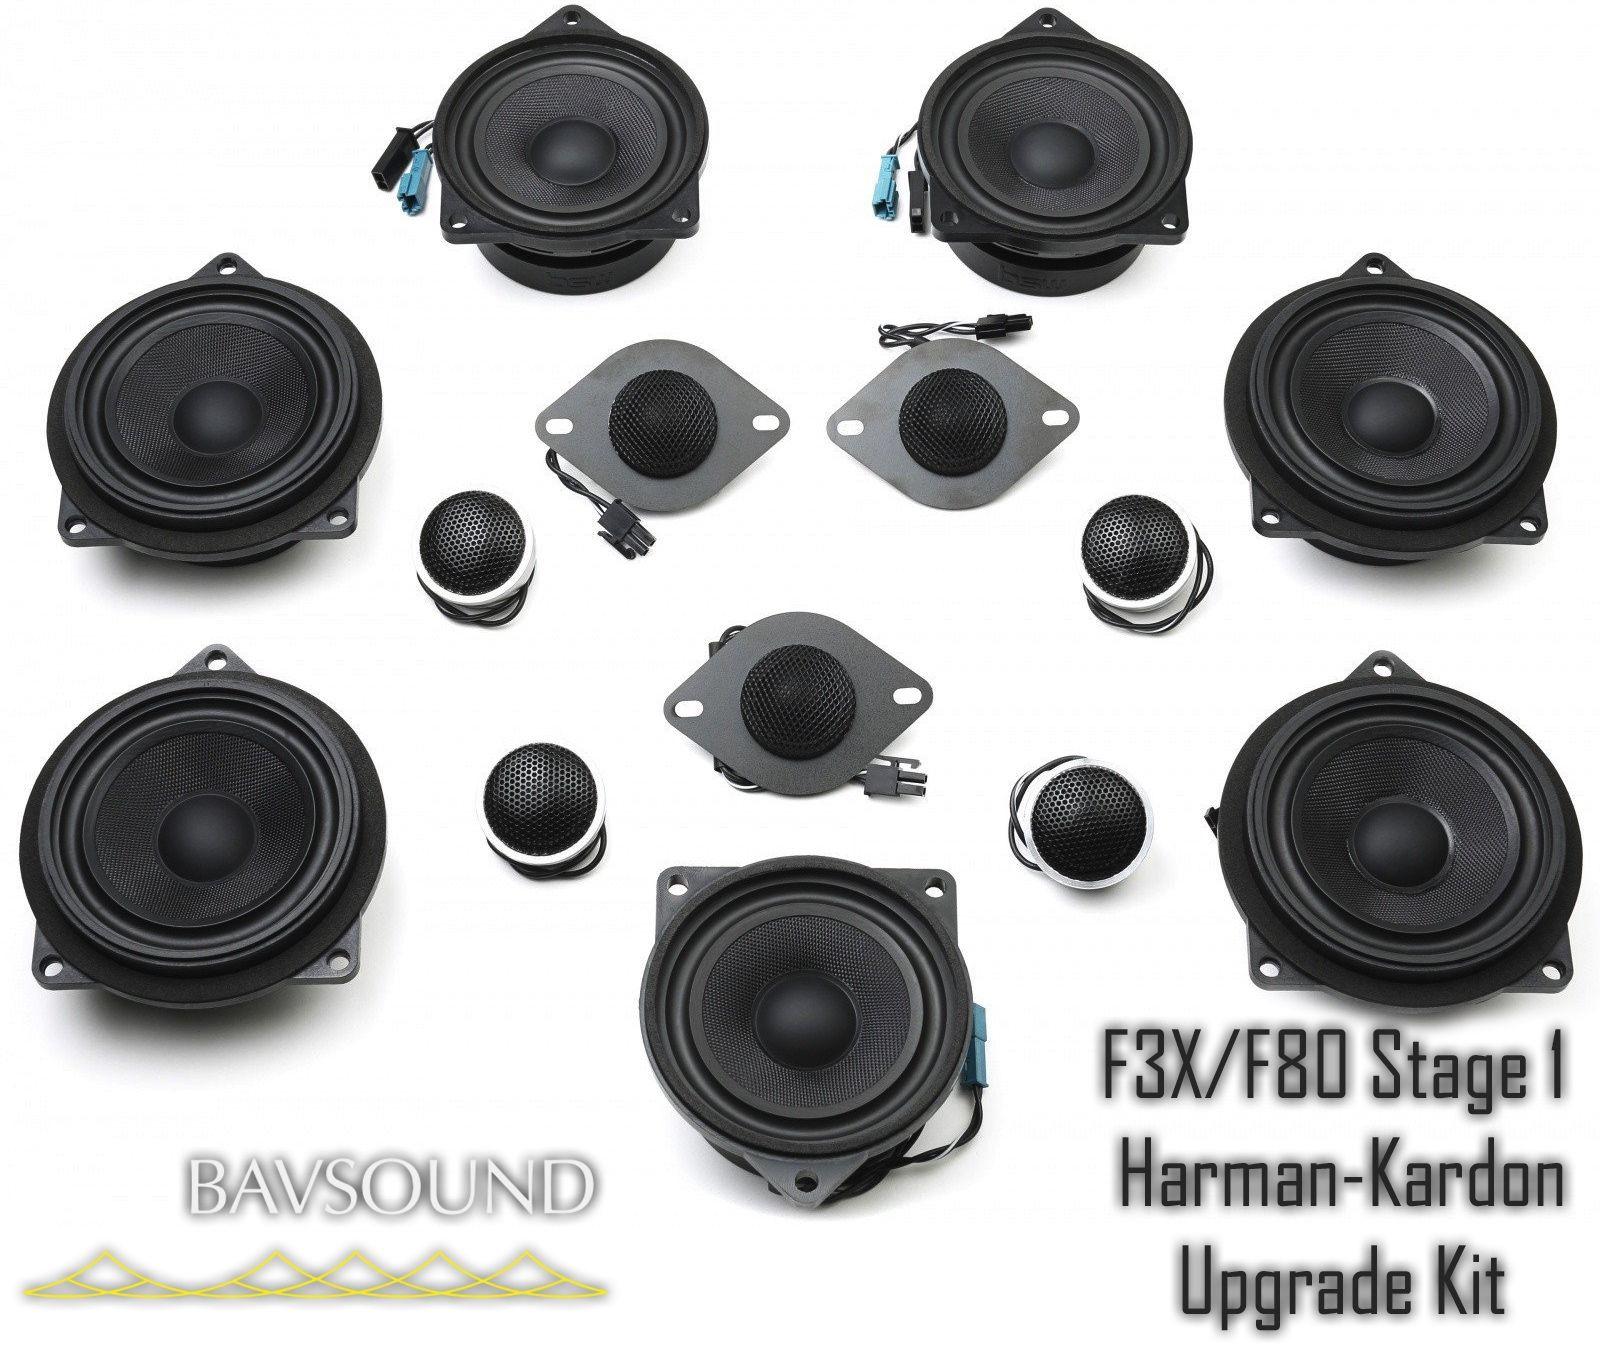 BAV Sound Stage 1 Kit BSD.S1.F30F31F34F80.THF-Kit